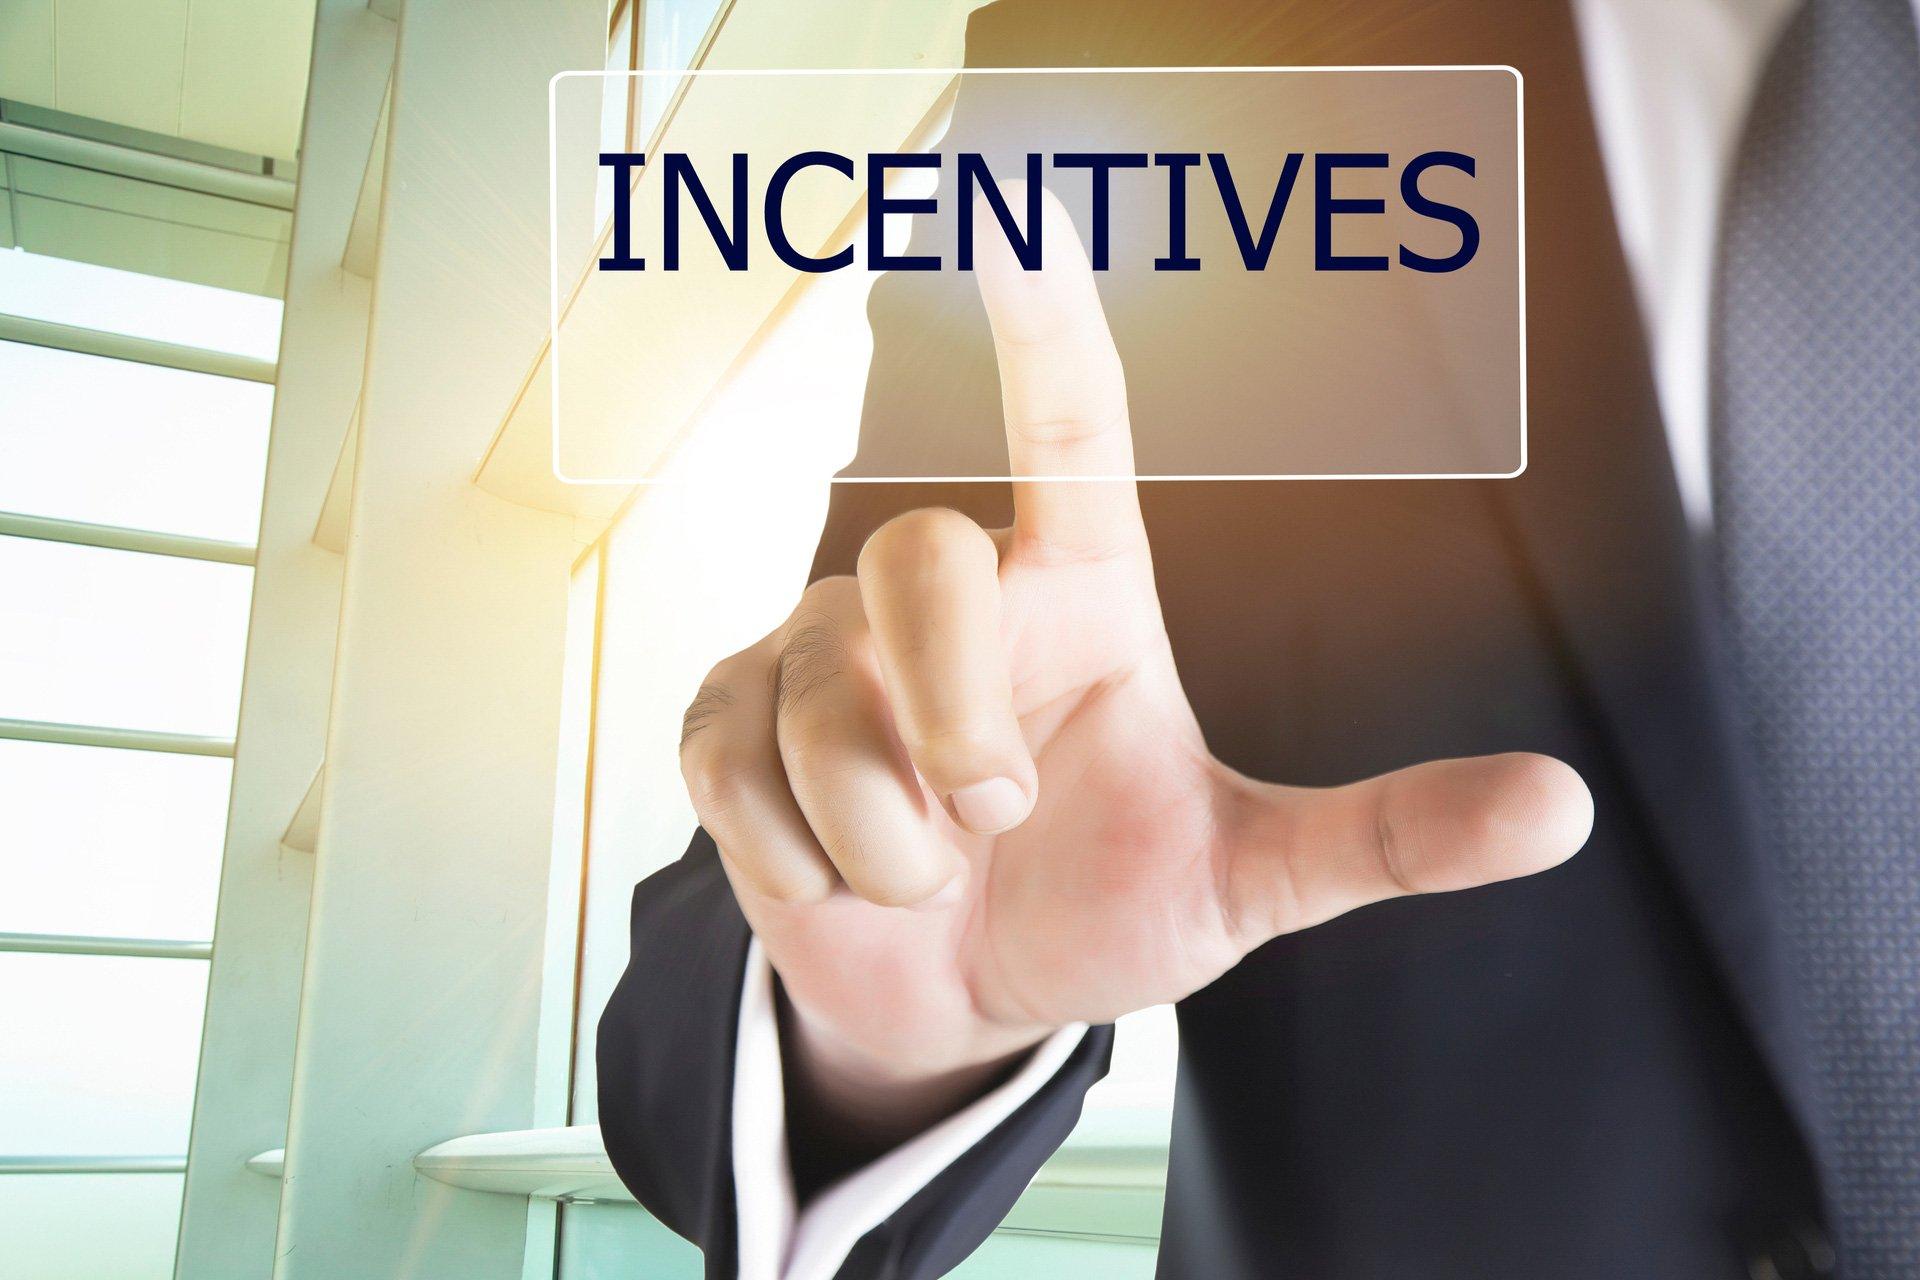 wellness plan incentives